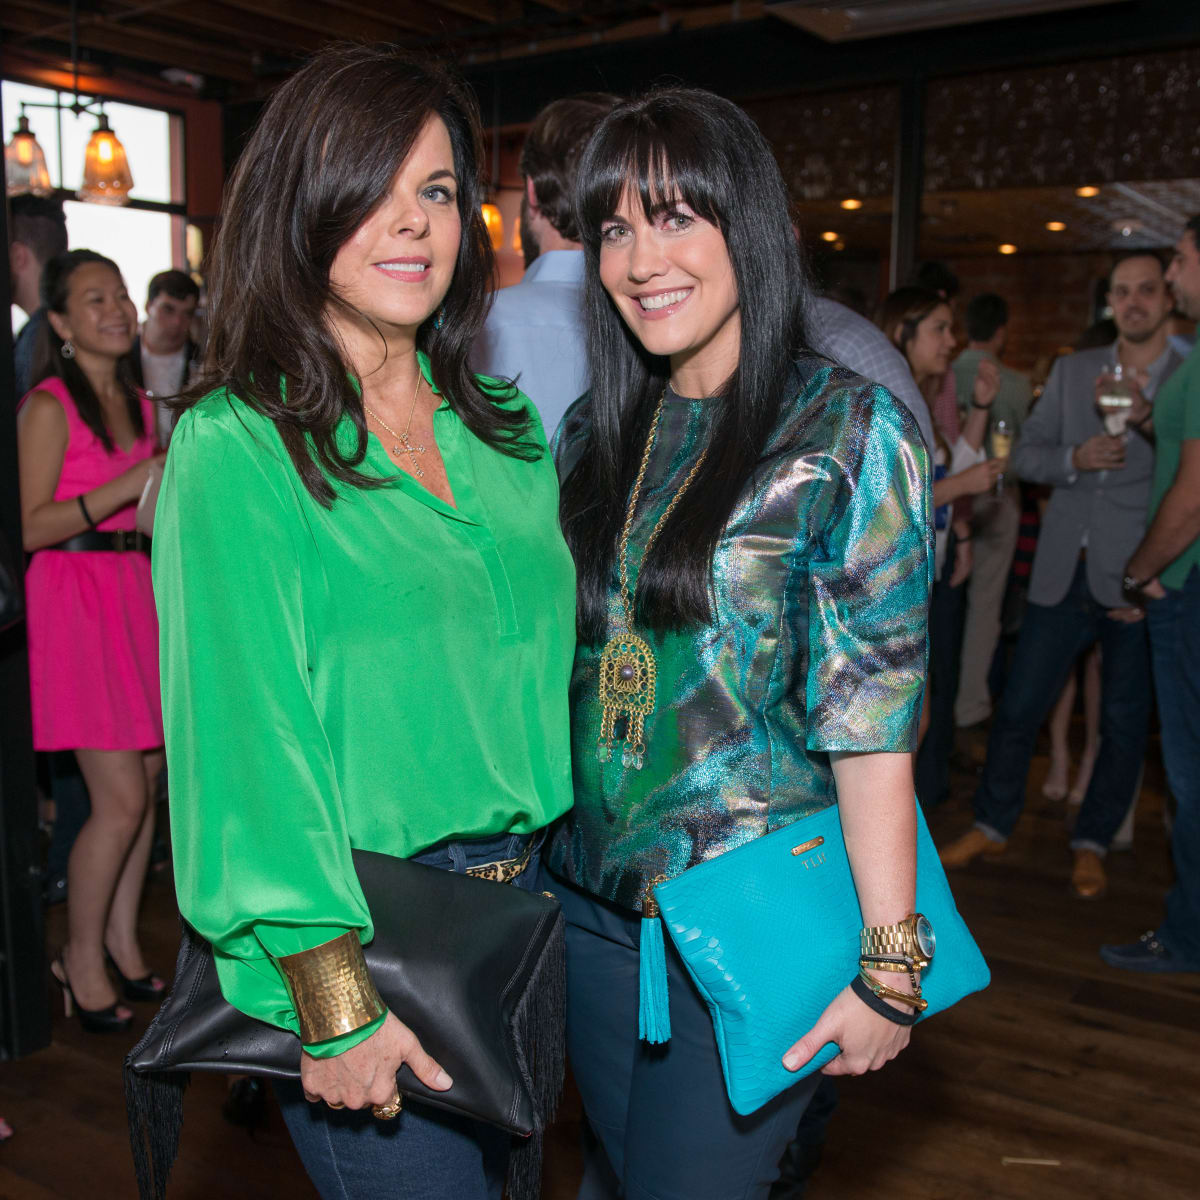 News, CultureMap Social, B&B Butchers, Sept. 2015 Julianna Montealegre, Tiffany Halik